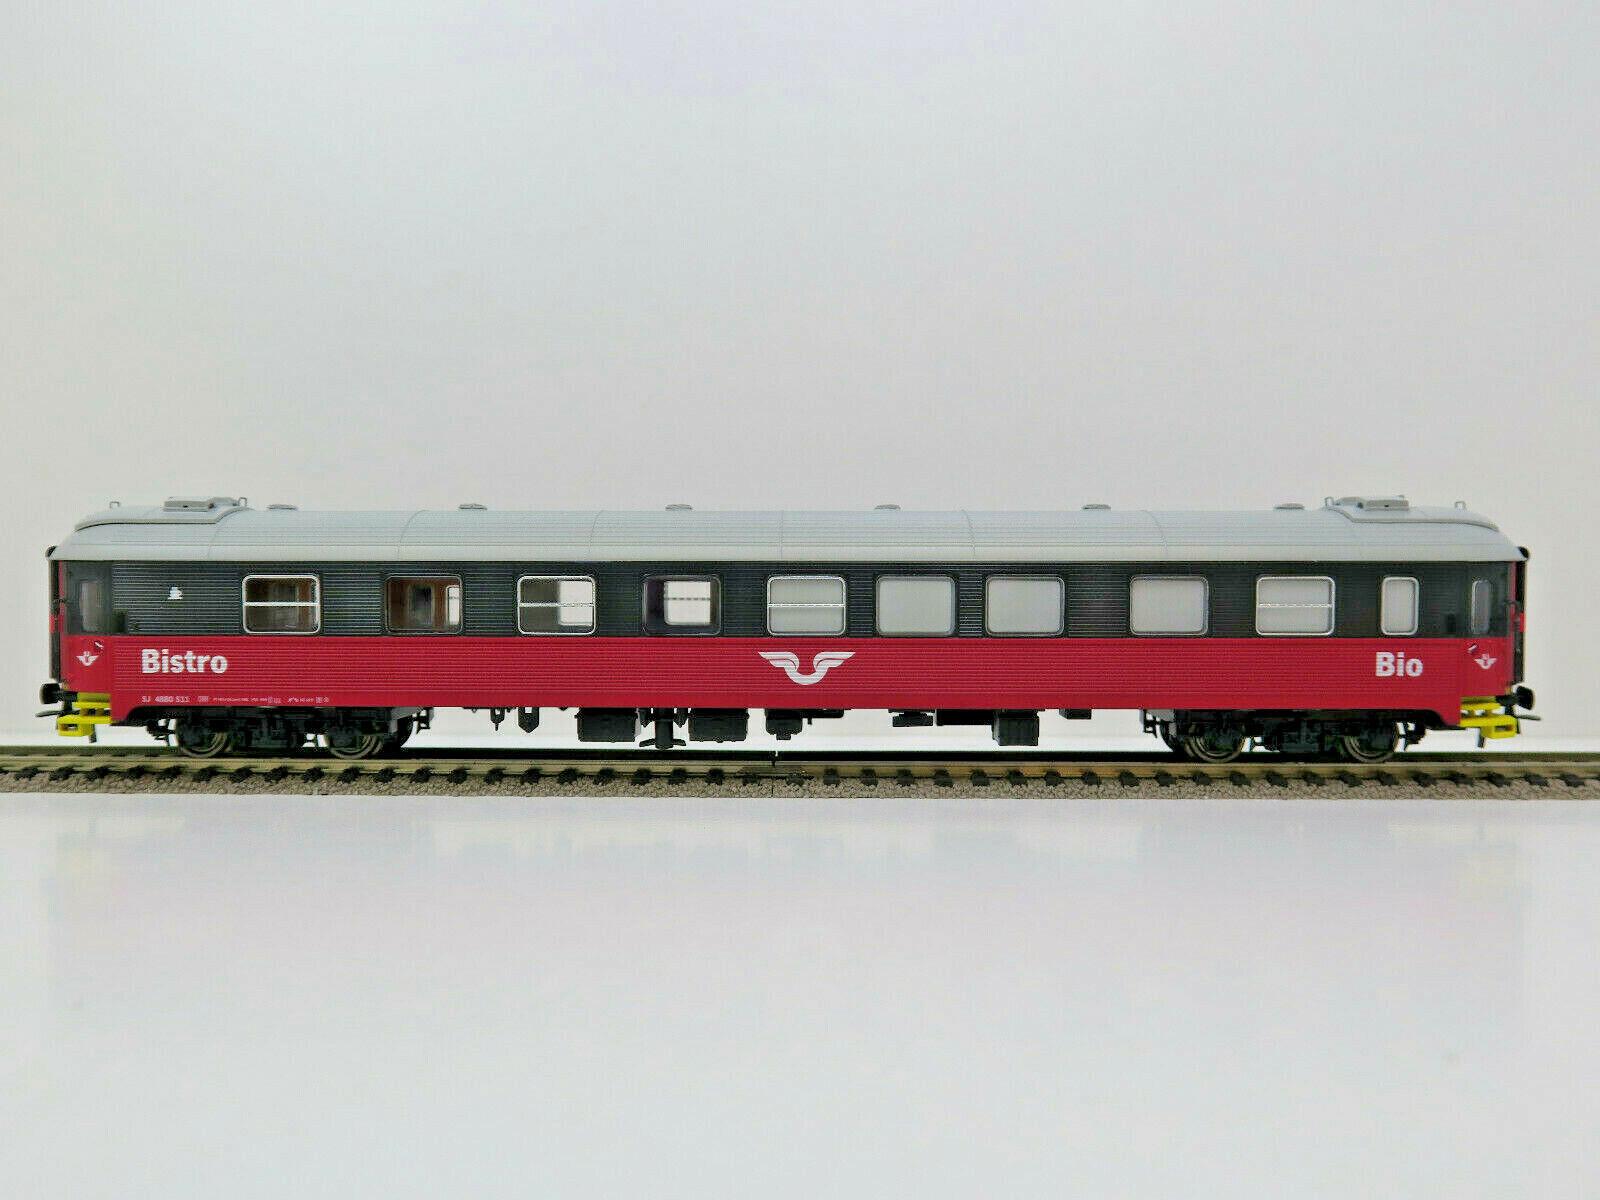 Kino Bistro Personenwagen,SJ,Schweden,Ep.III-V,NMJ Topline HO,202.502,OVP,NEU      Zuverlässige Qualität  7b6dc3